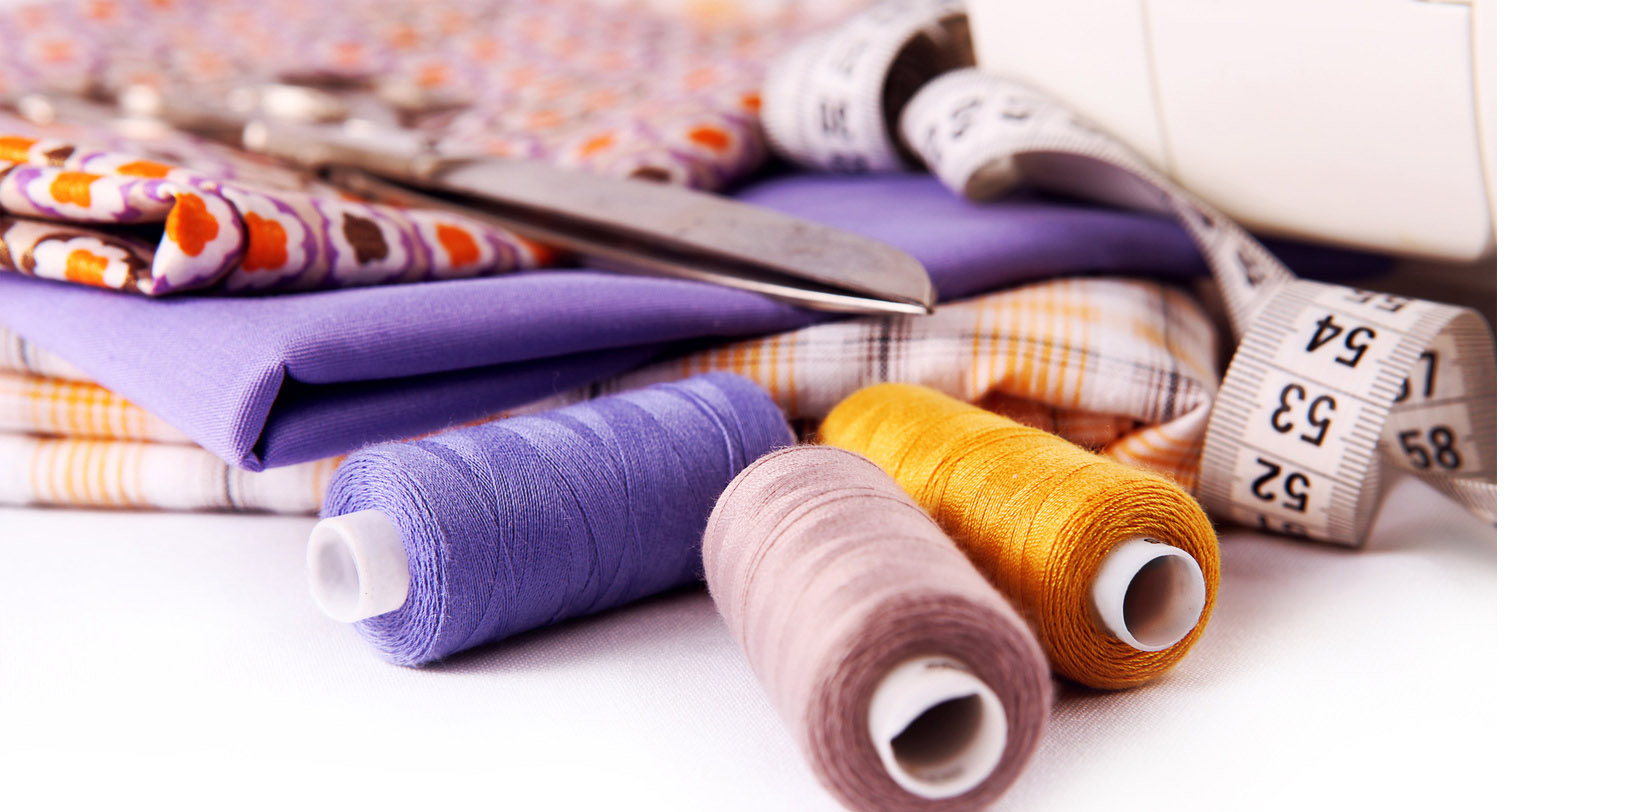 In April 2017, Sri Lankan textile exports up 3%